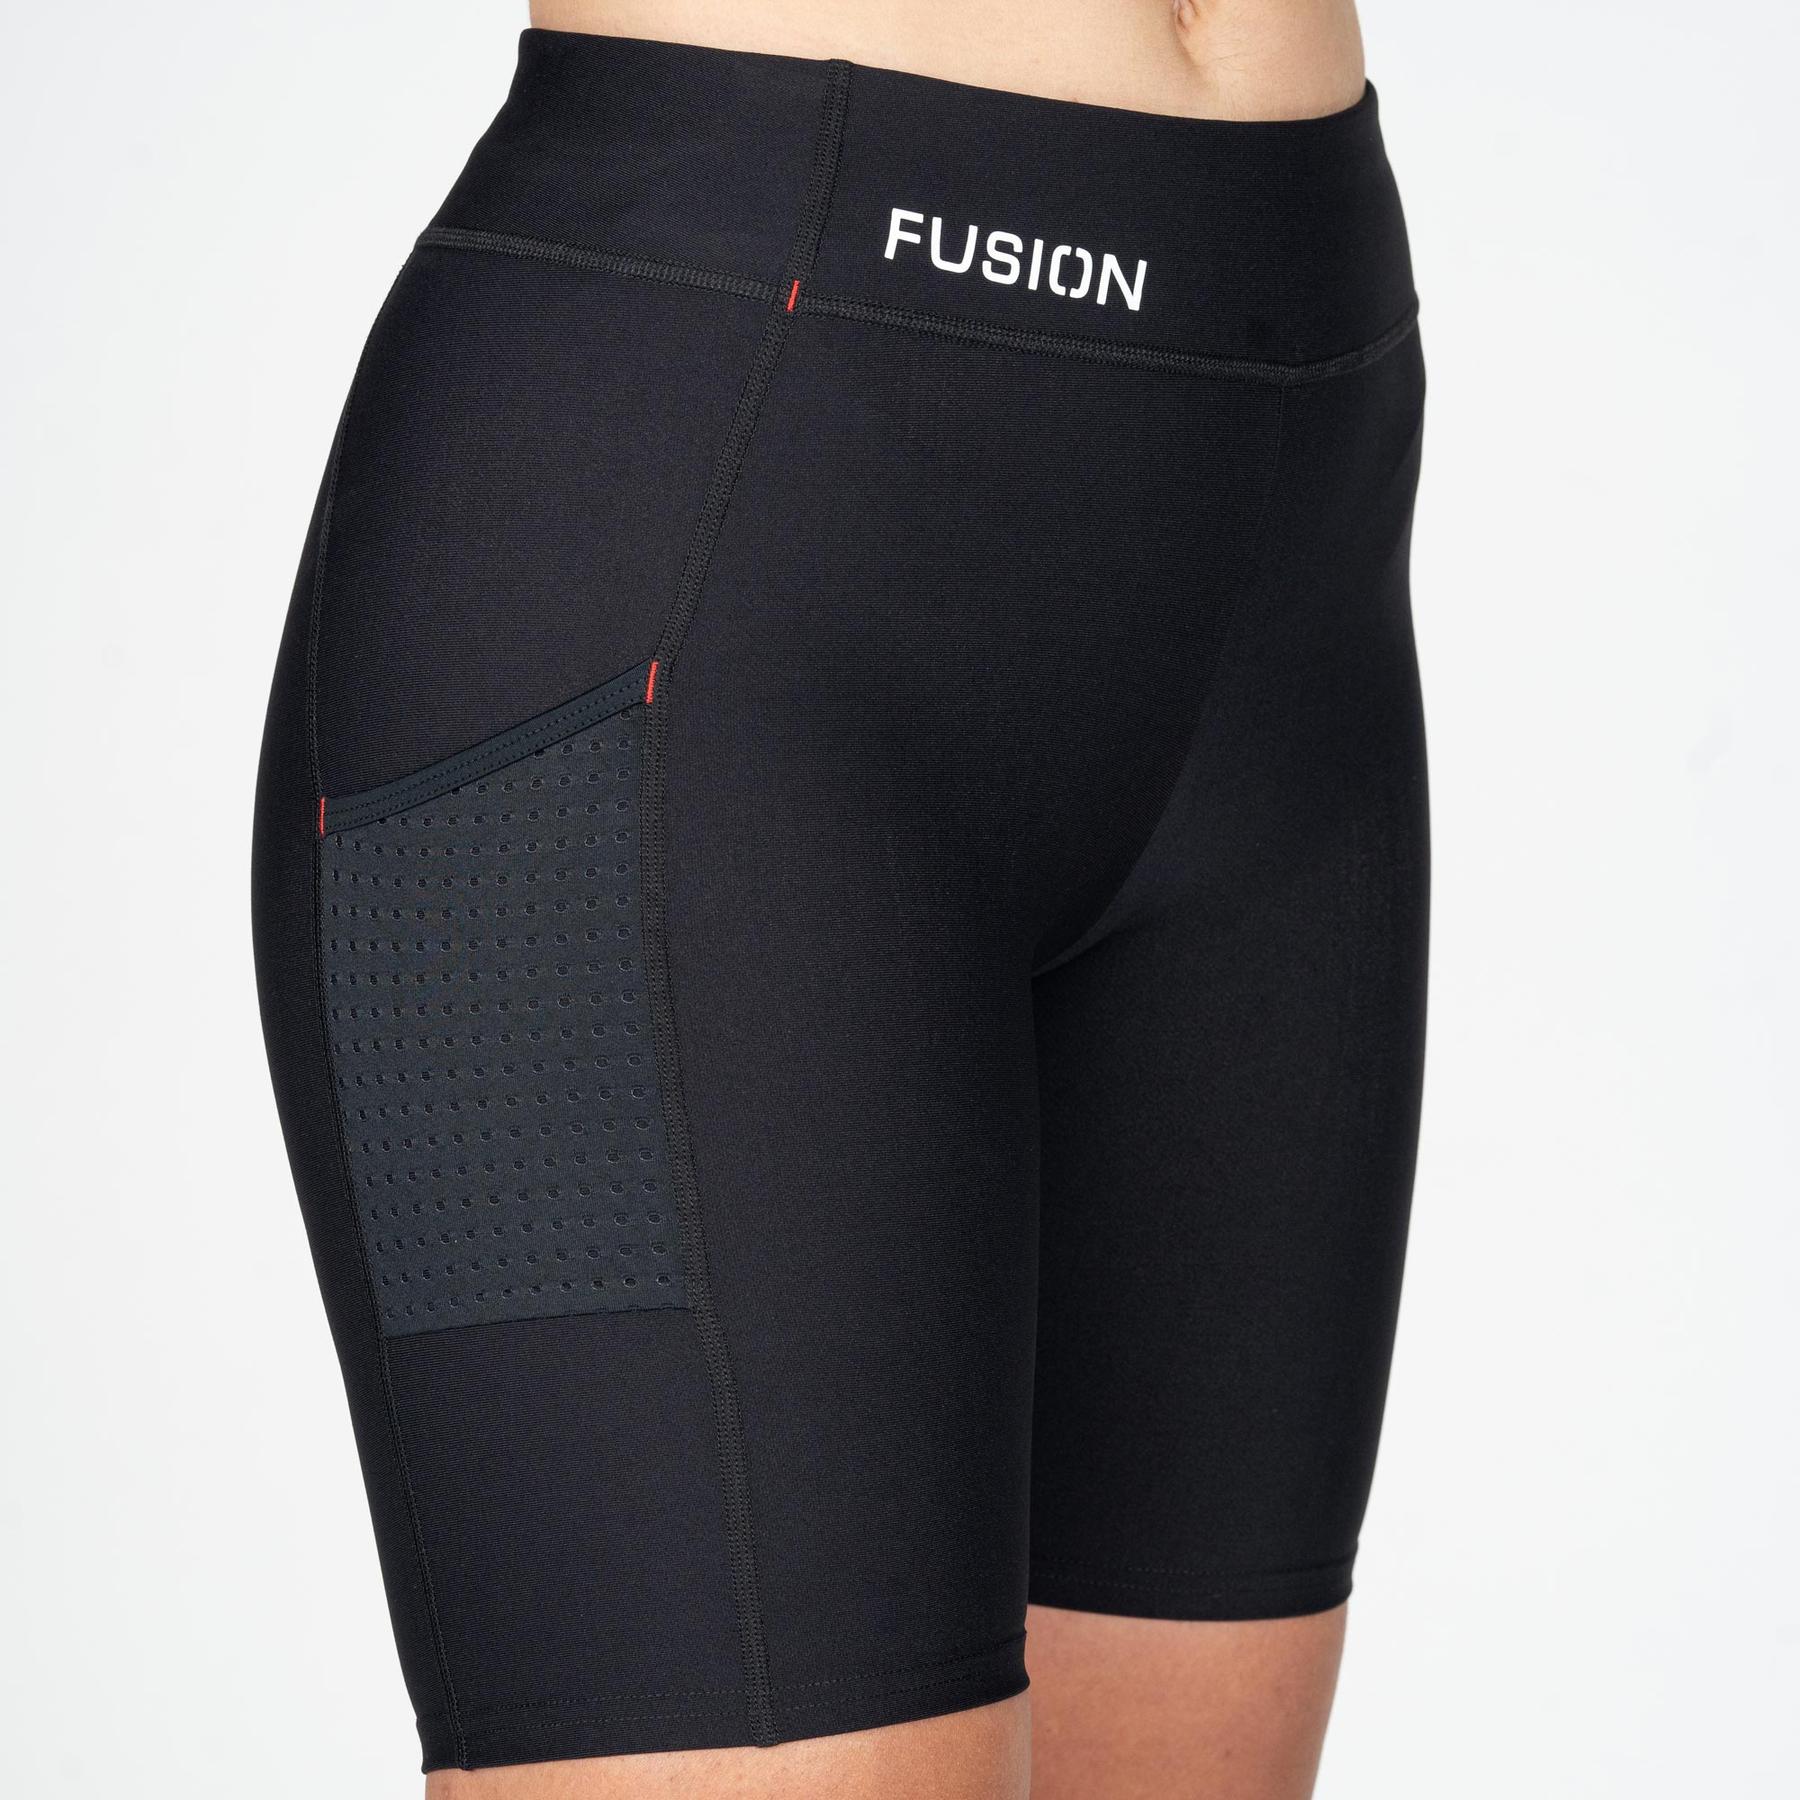 Fusion Wms C3 Plus Short Training Tights